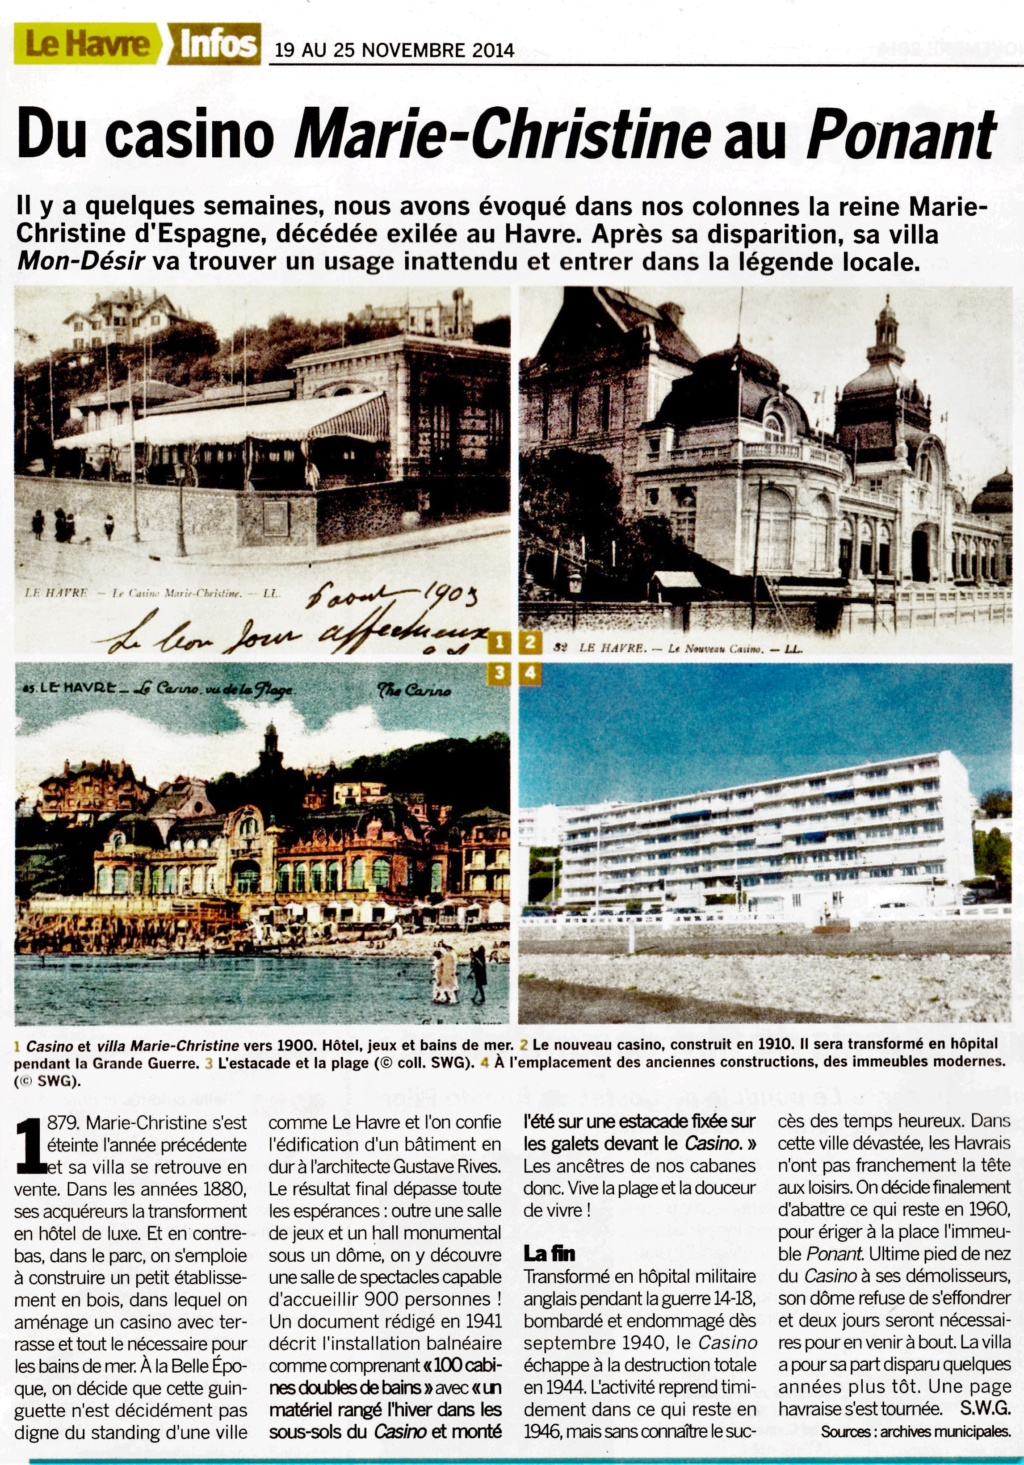 Le Havre - Casino Marie-Christine 2014-113